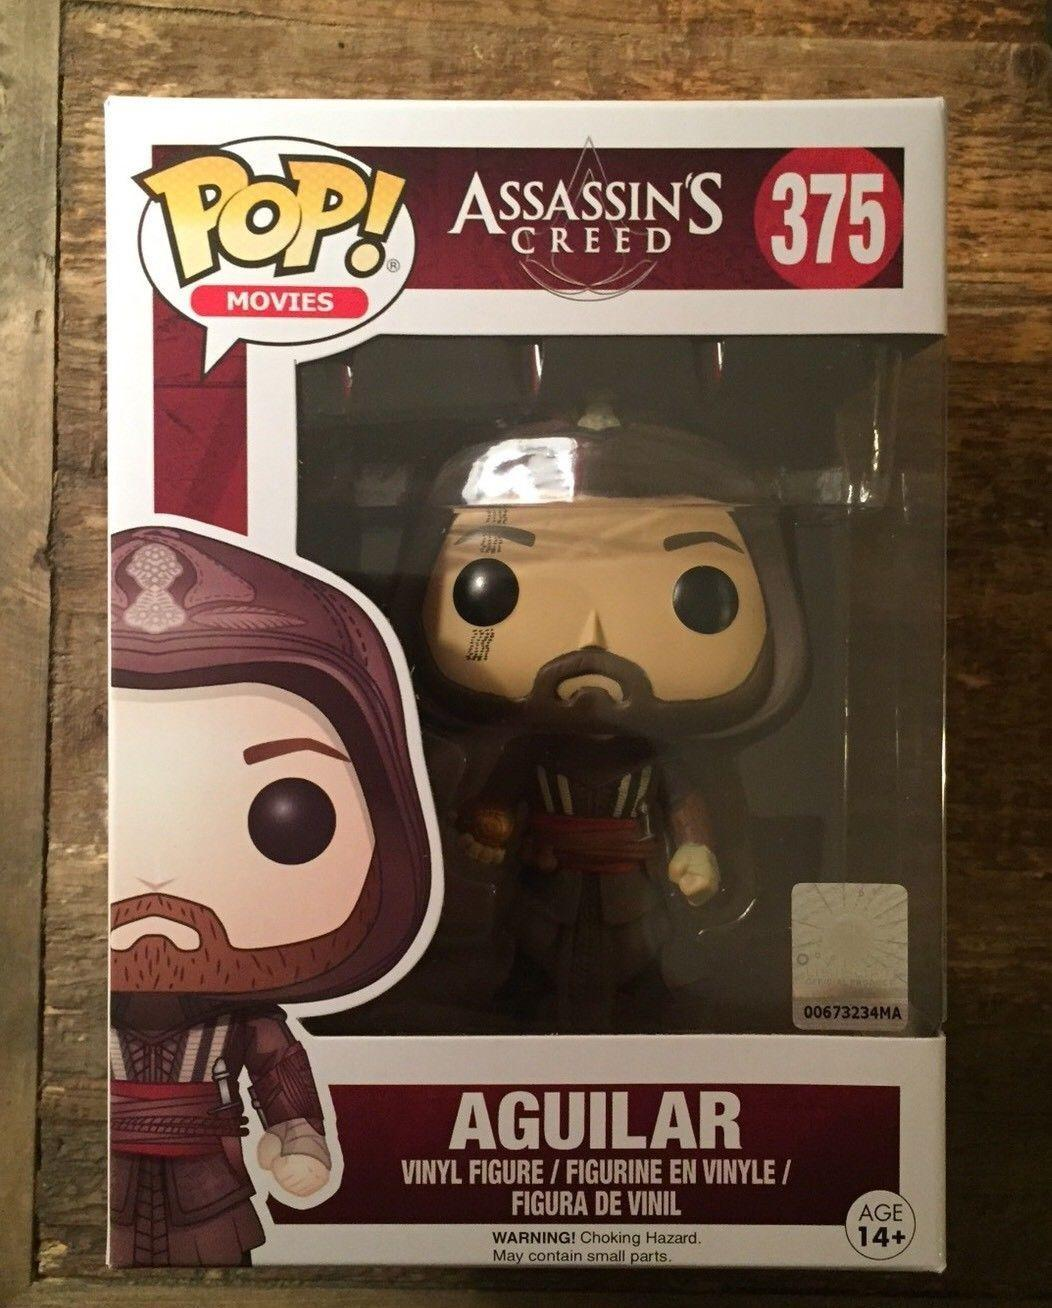 NEW !!! Movie Assassin/'s Creed !! Funko POP Aguilar  375